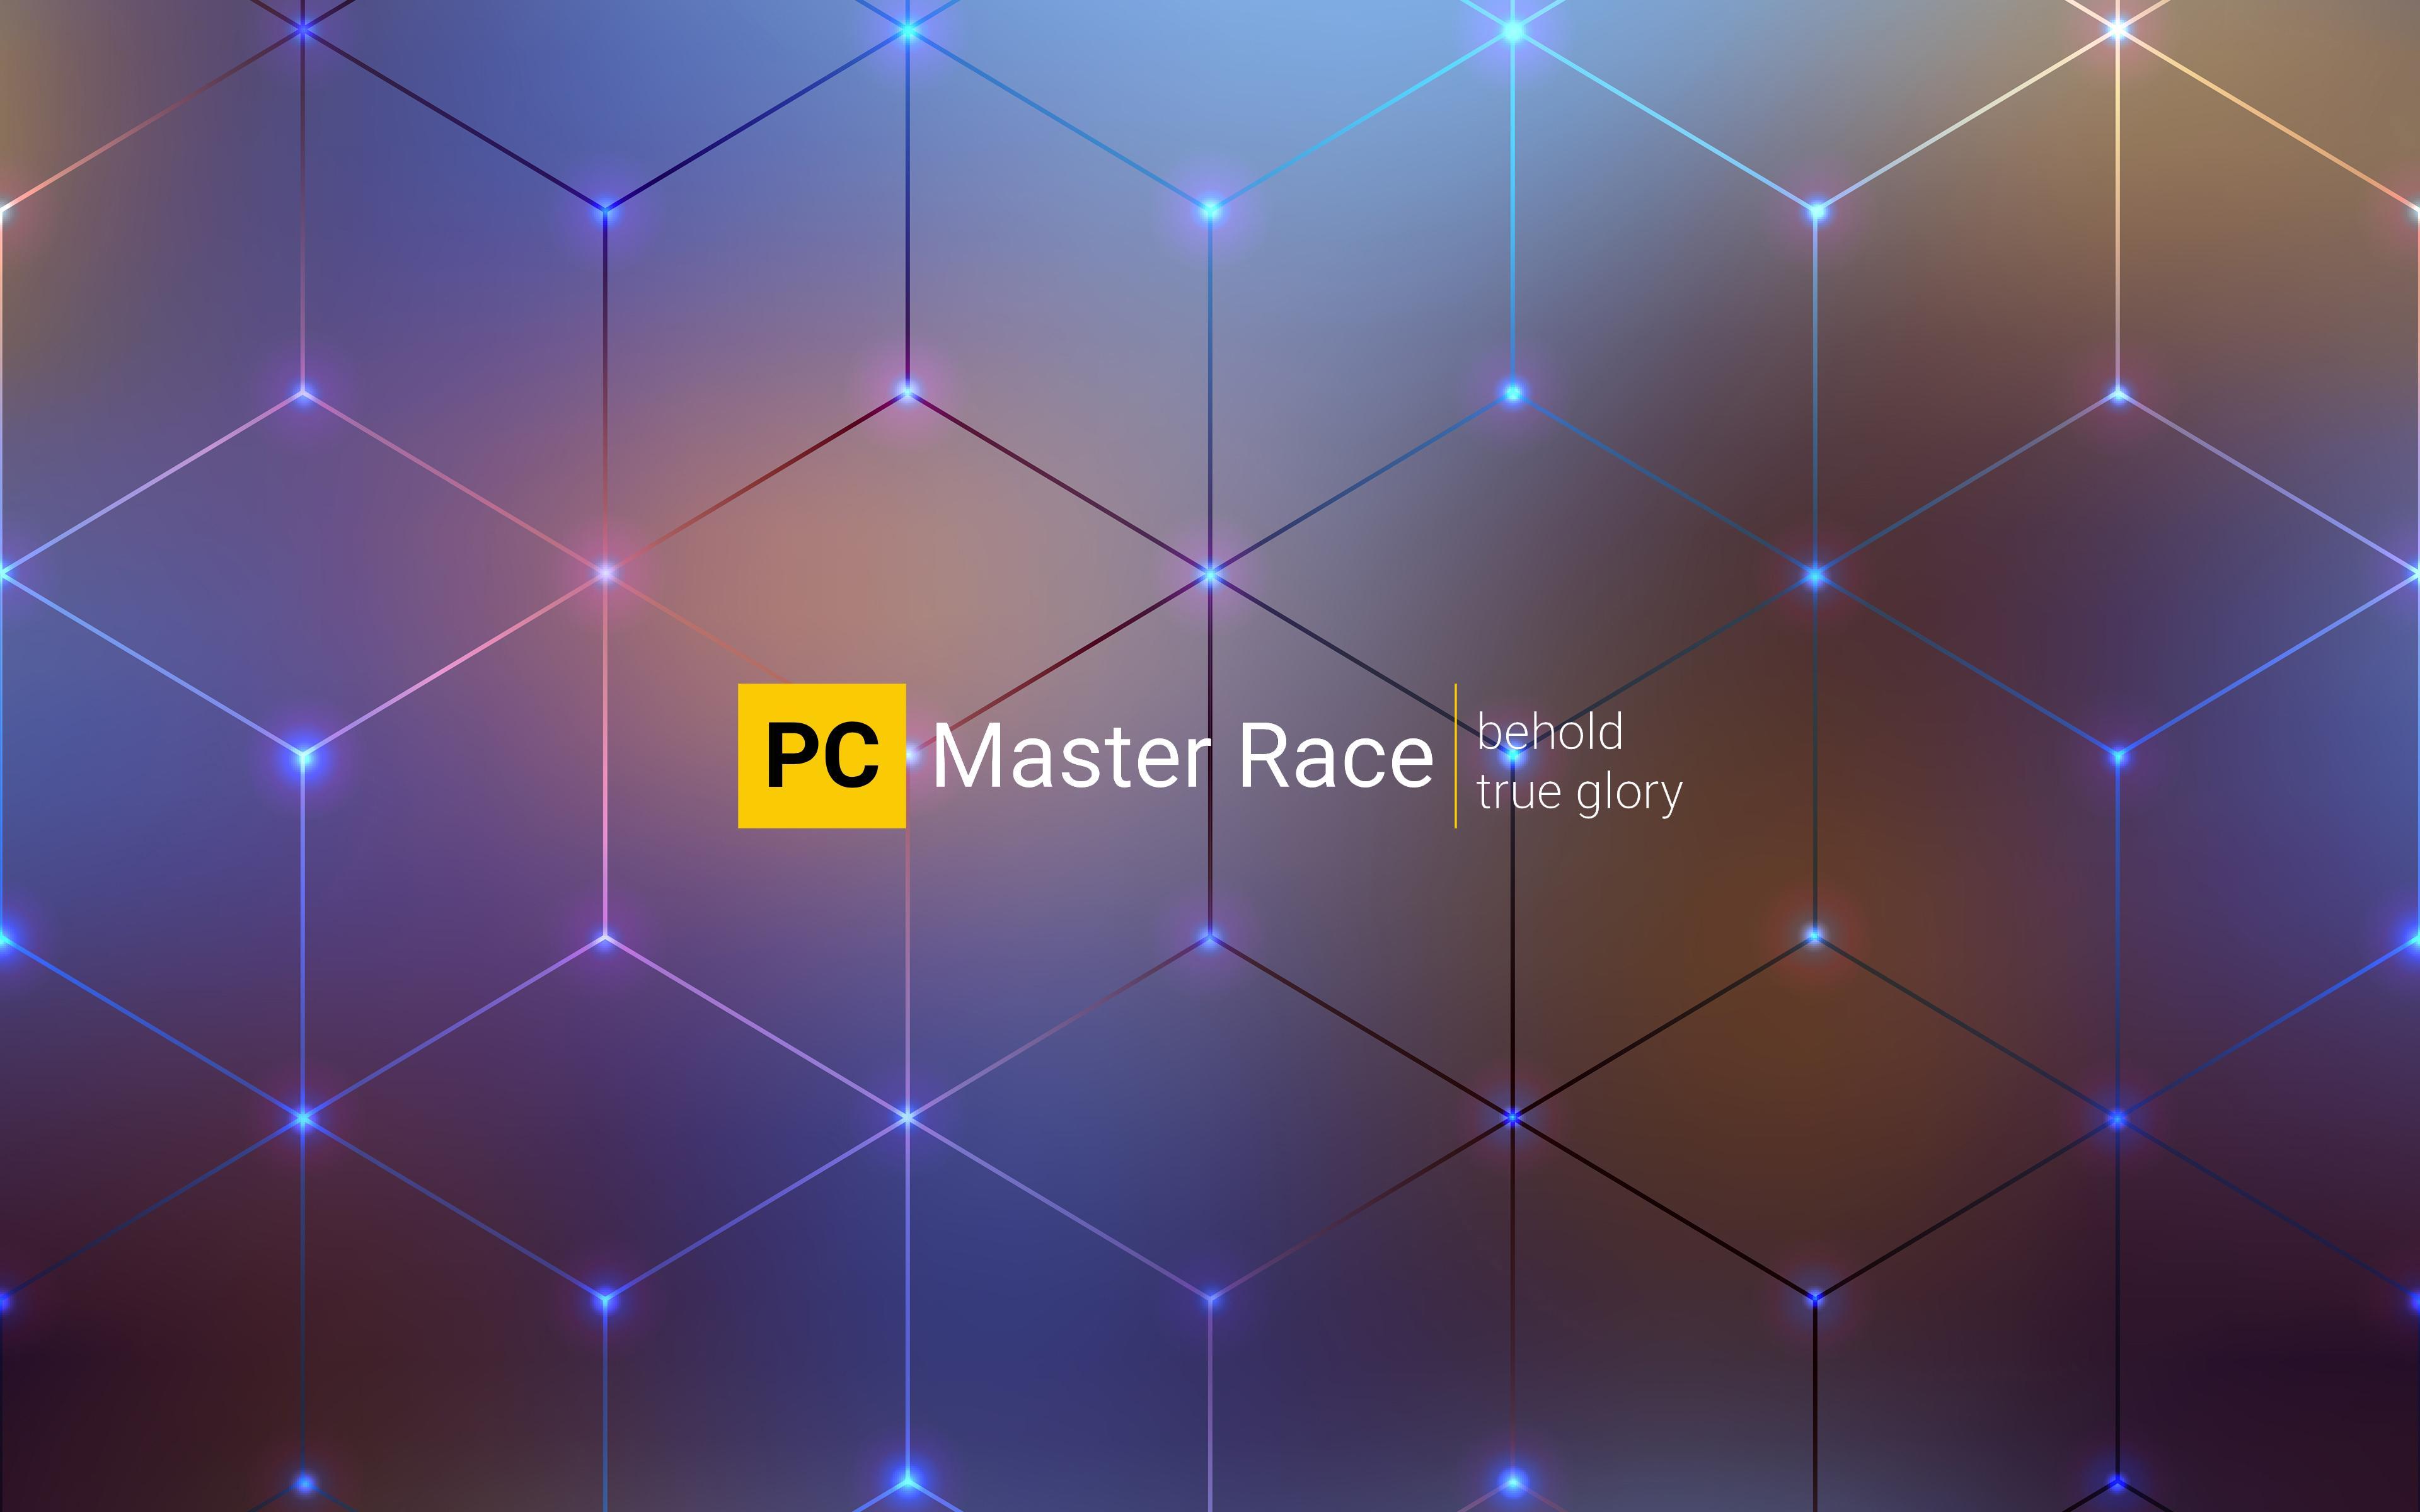 4k Pc Master Race Wallpaper Posted By Zoey Peltier